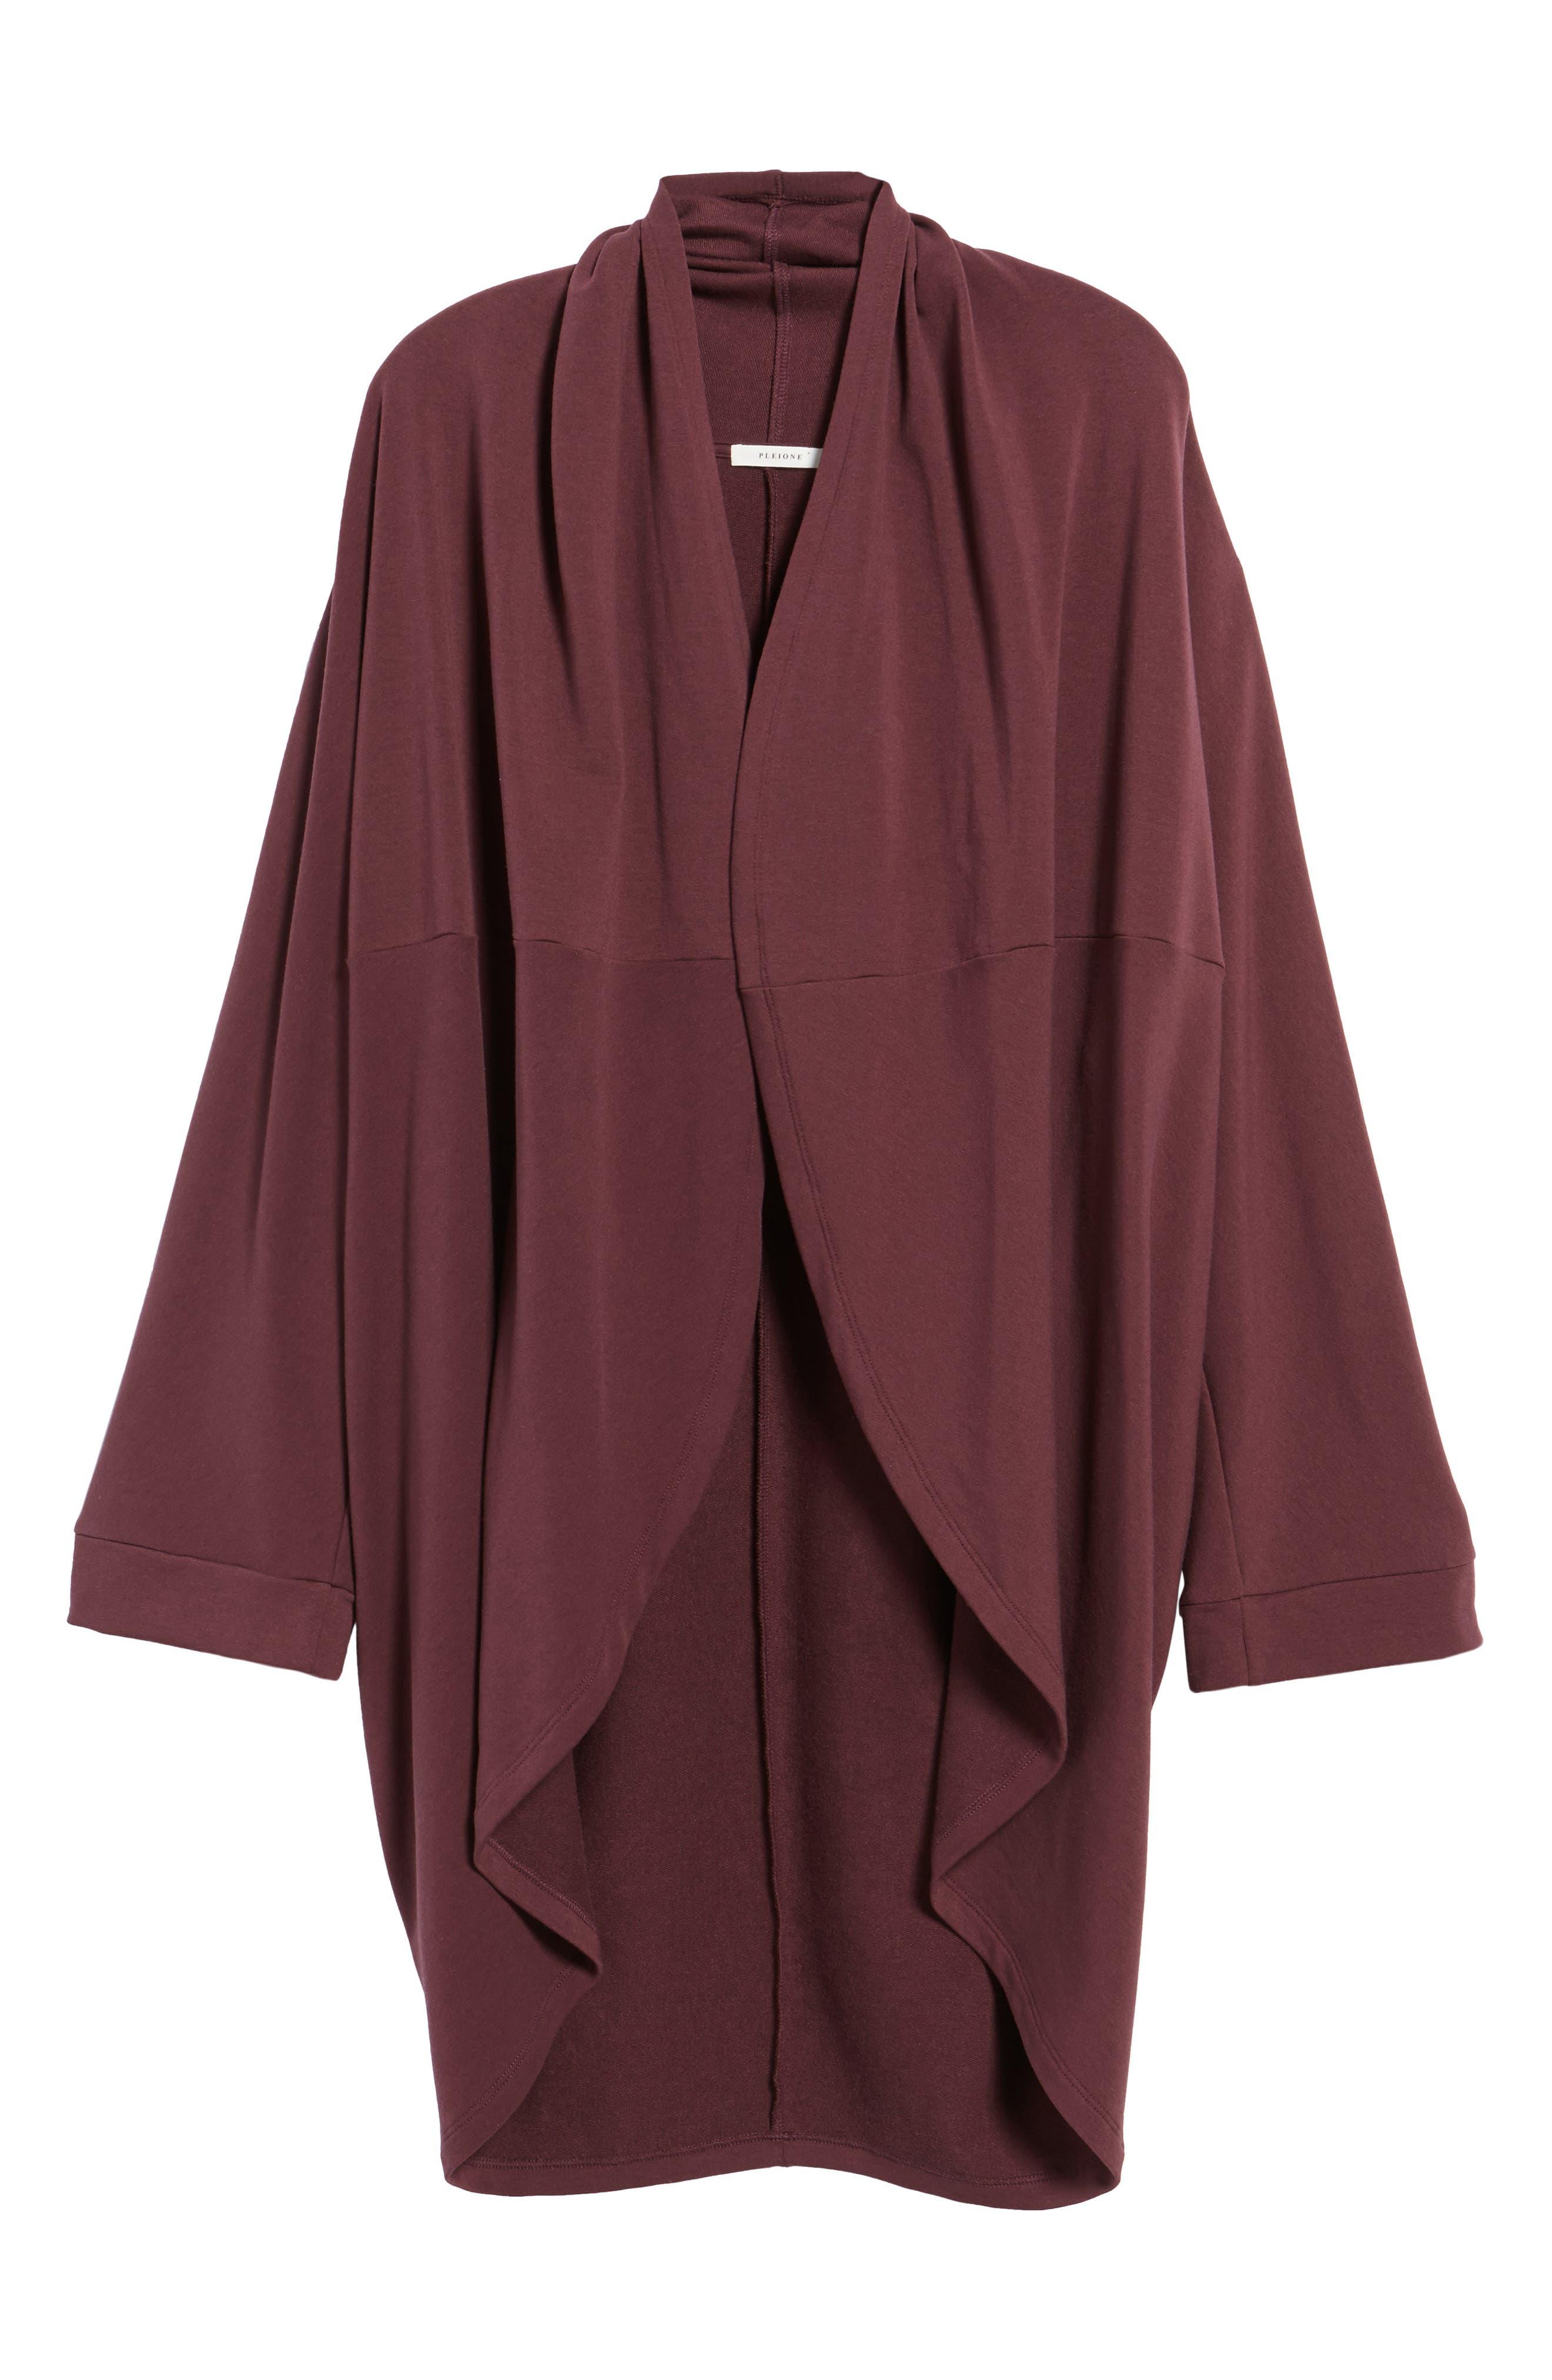 Cocoon Knit Midi Cardigan,                             Alternate thumbnail 29, color,